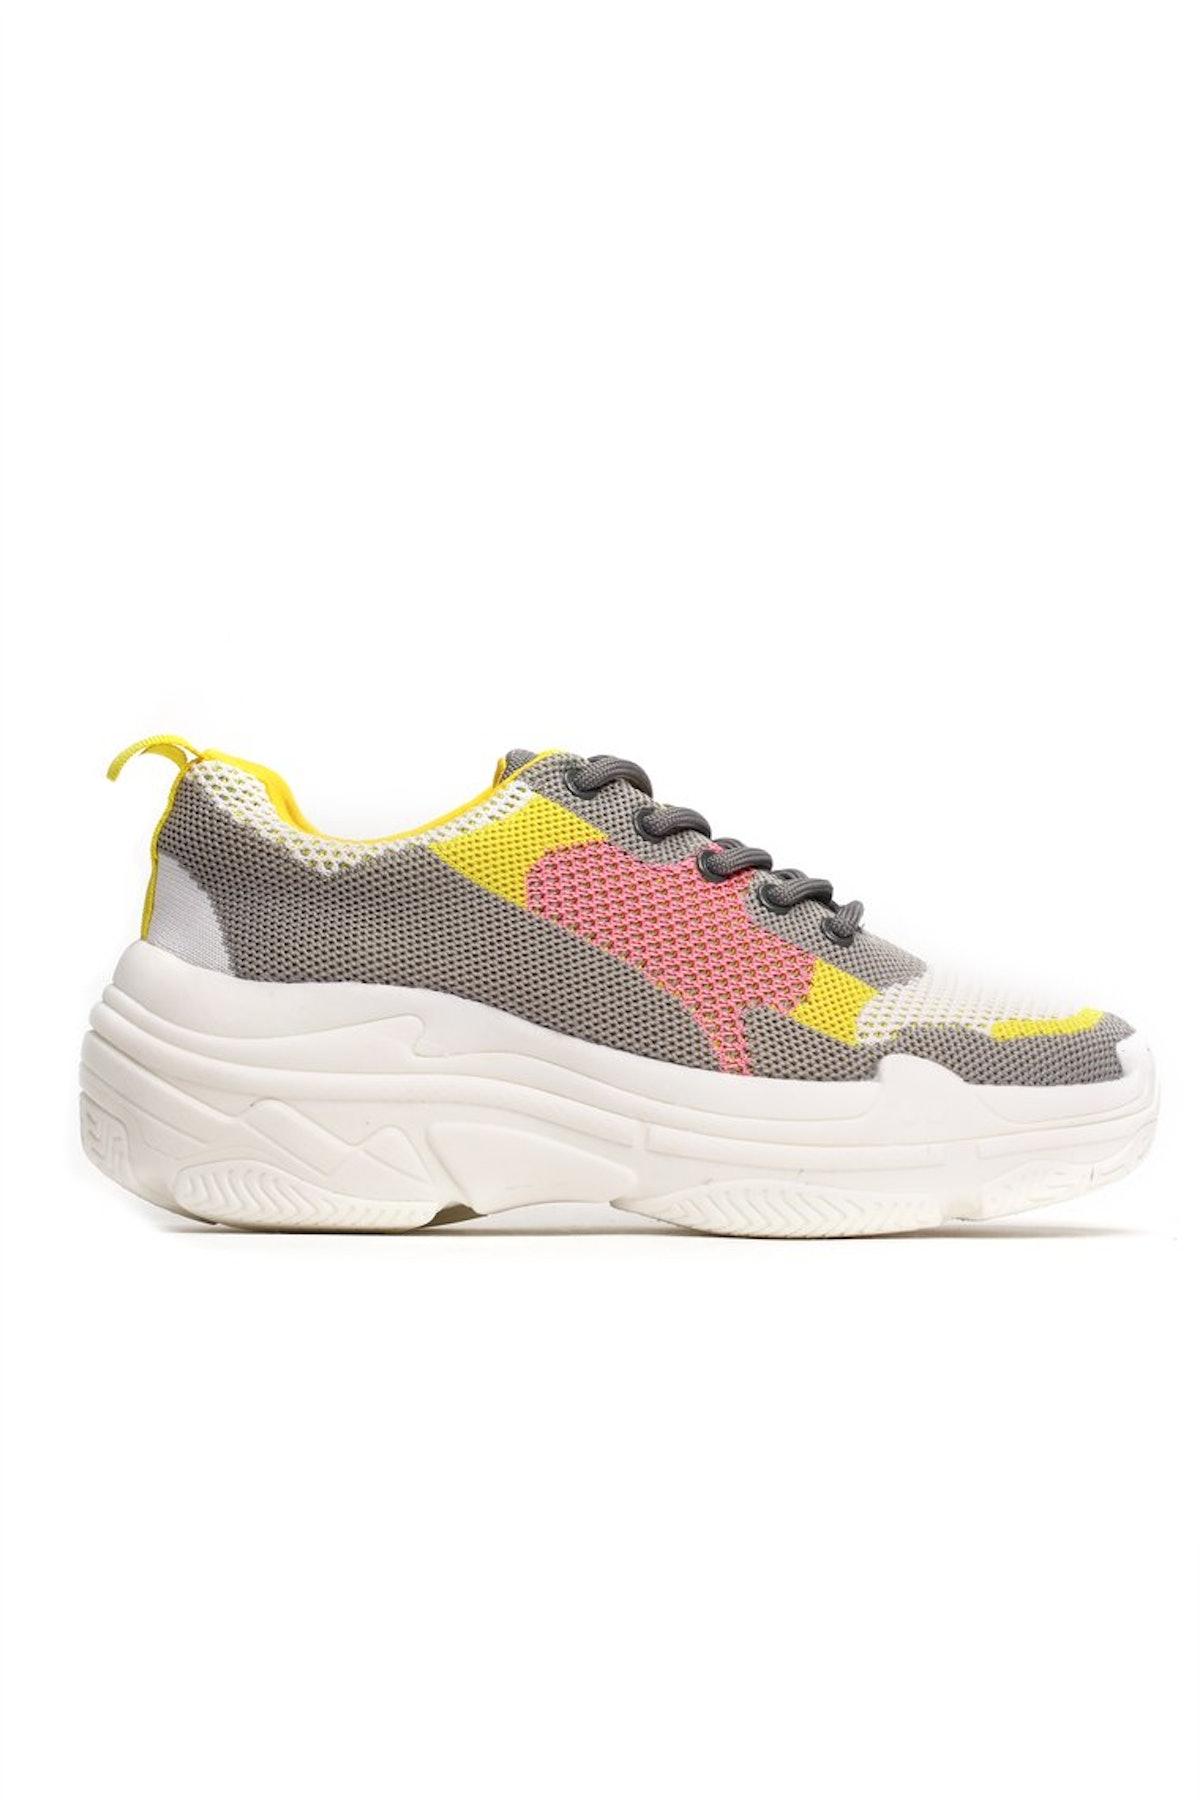 Like I Said Sneaker